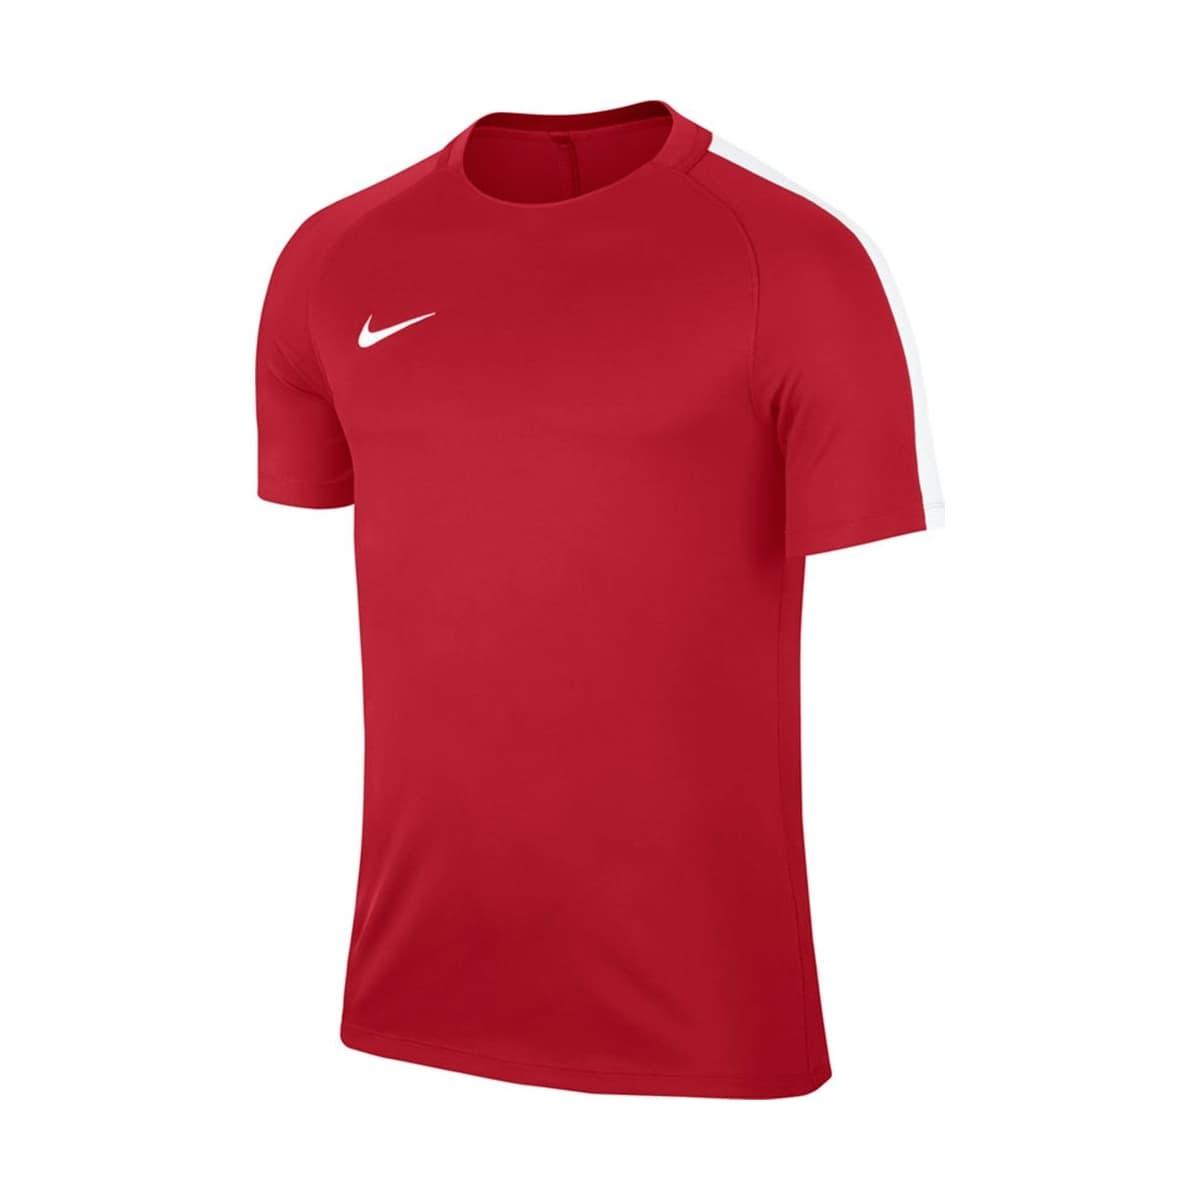 Dri-Fit Squad17 Erkek Kırmızı Spor Tişört (831567-657)